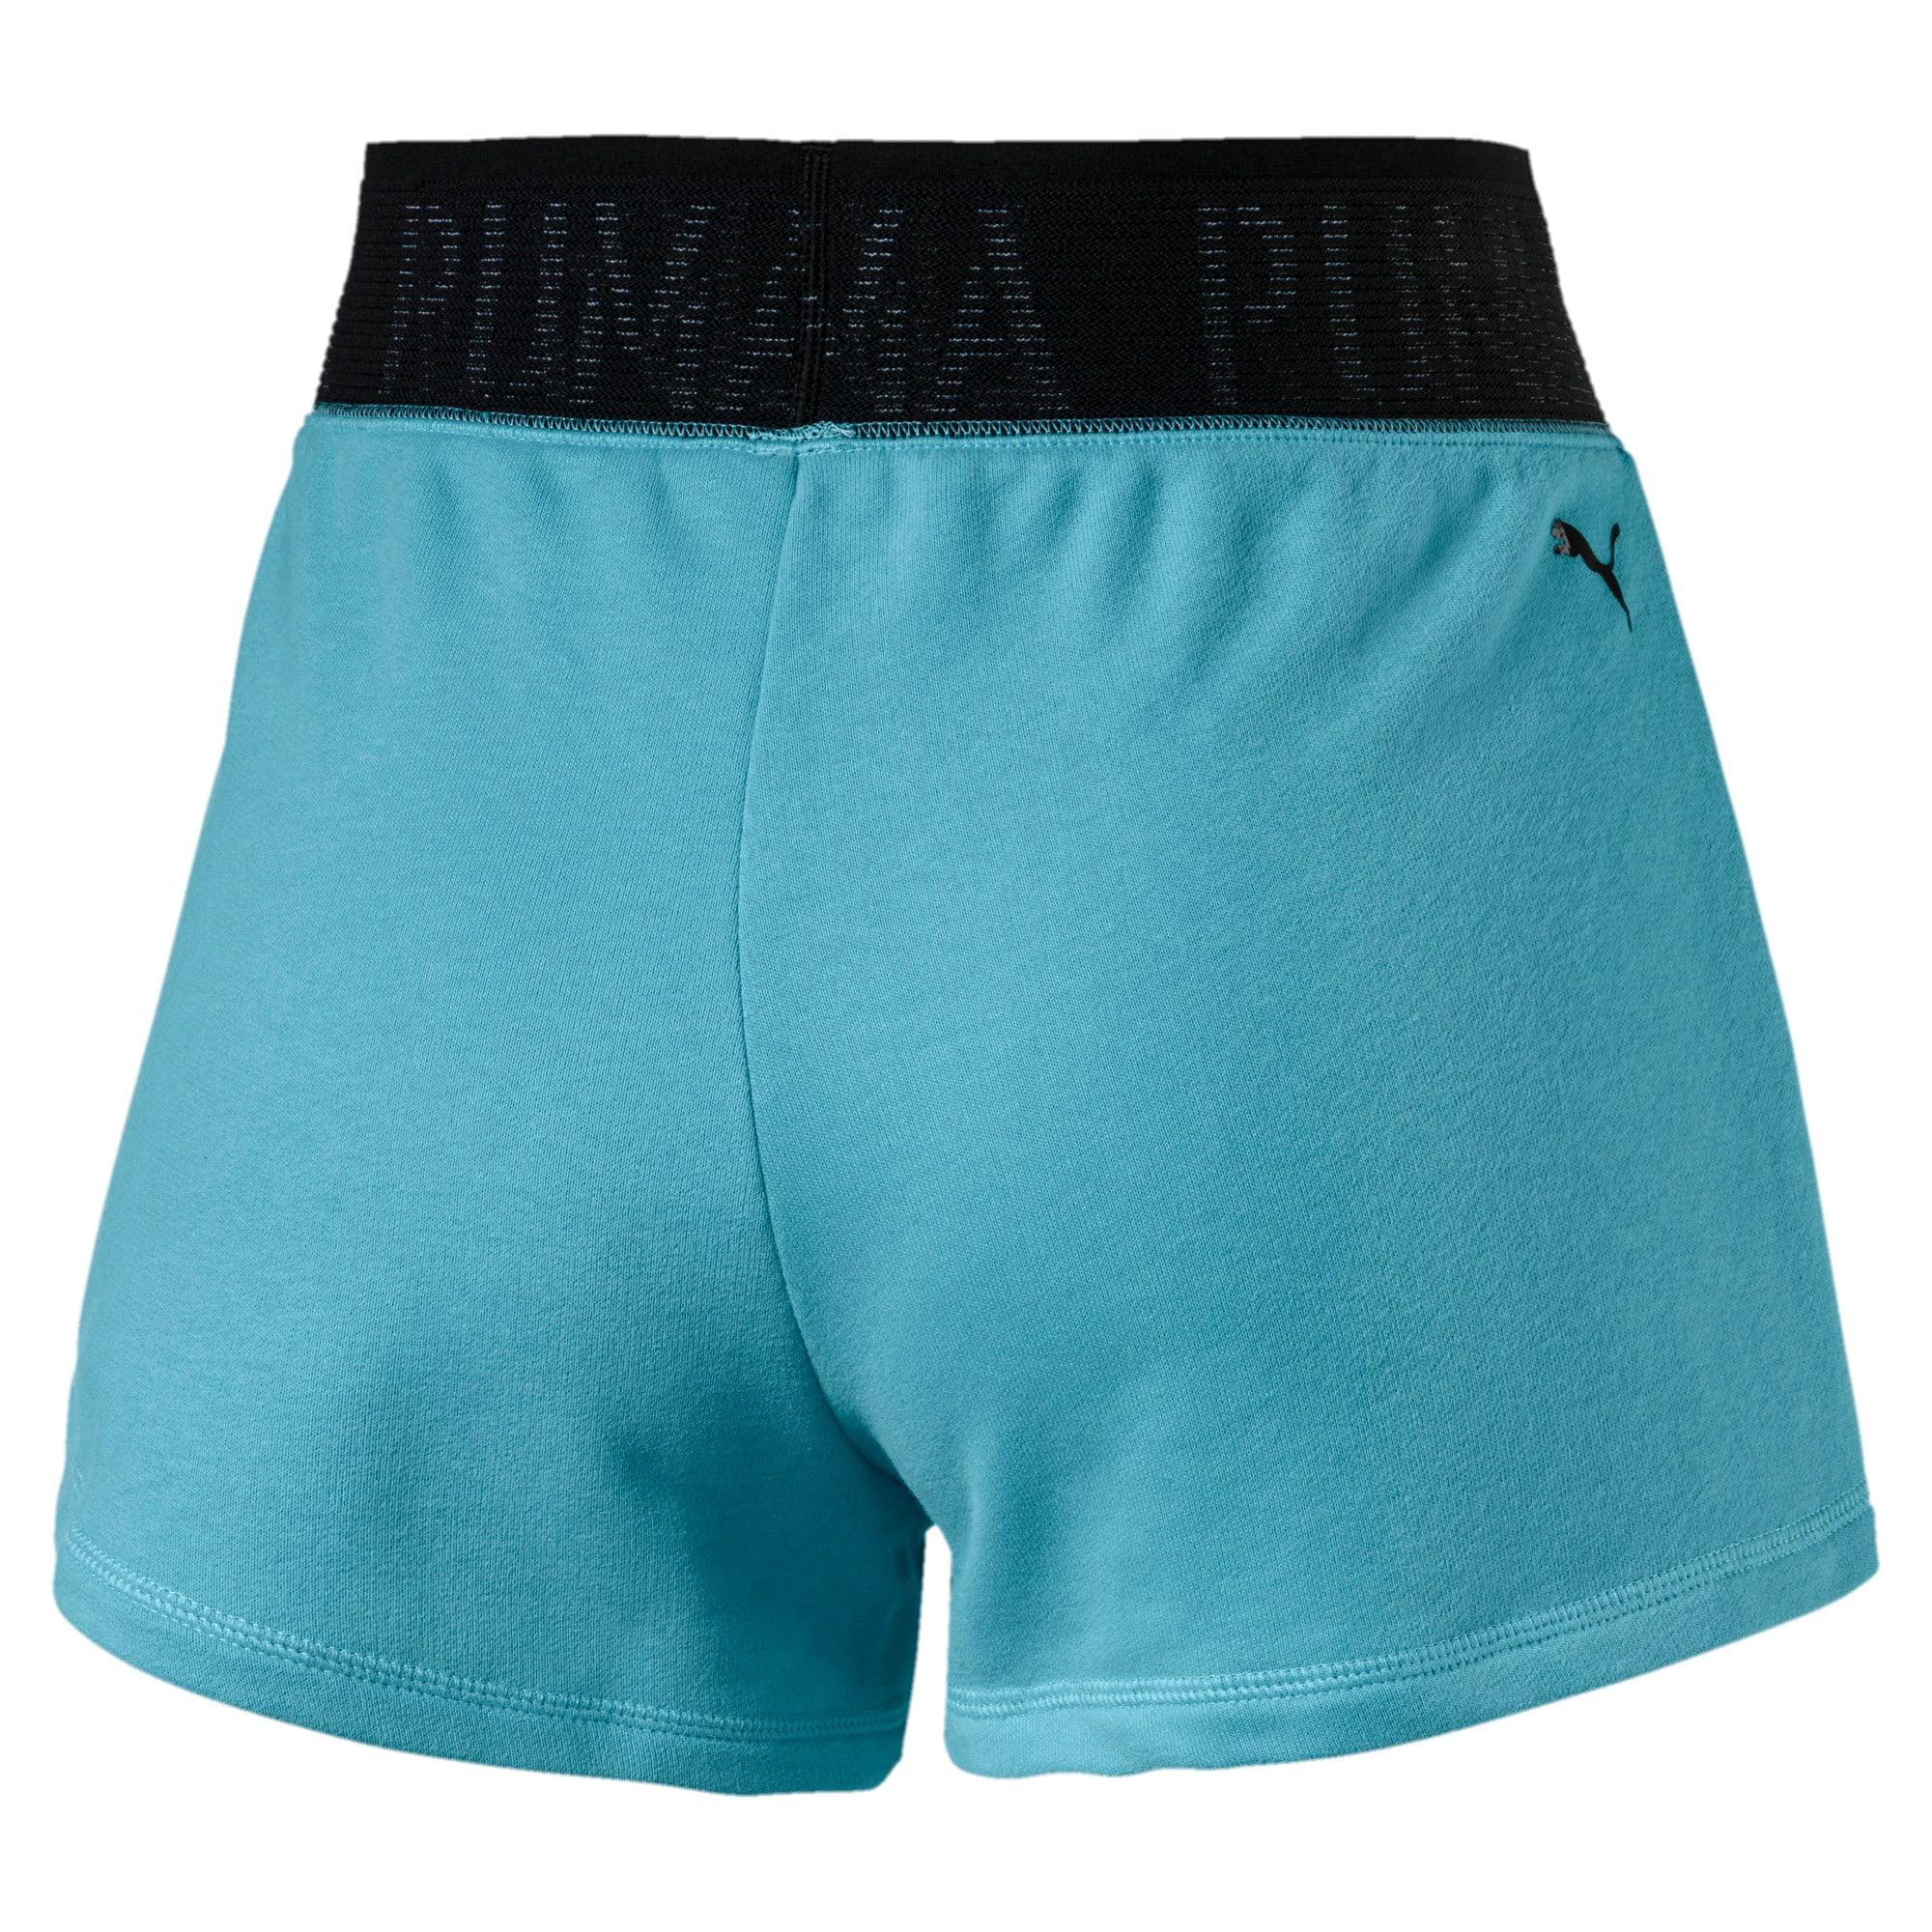 Miniatura 5 de Shorts con logo para mujer, Milky Blue Heather, mediano